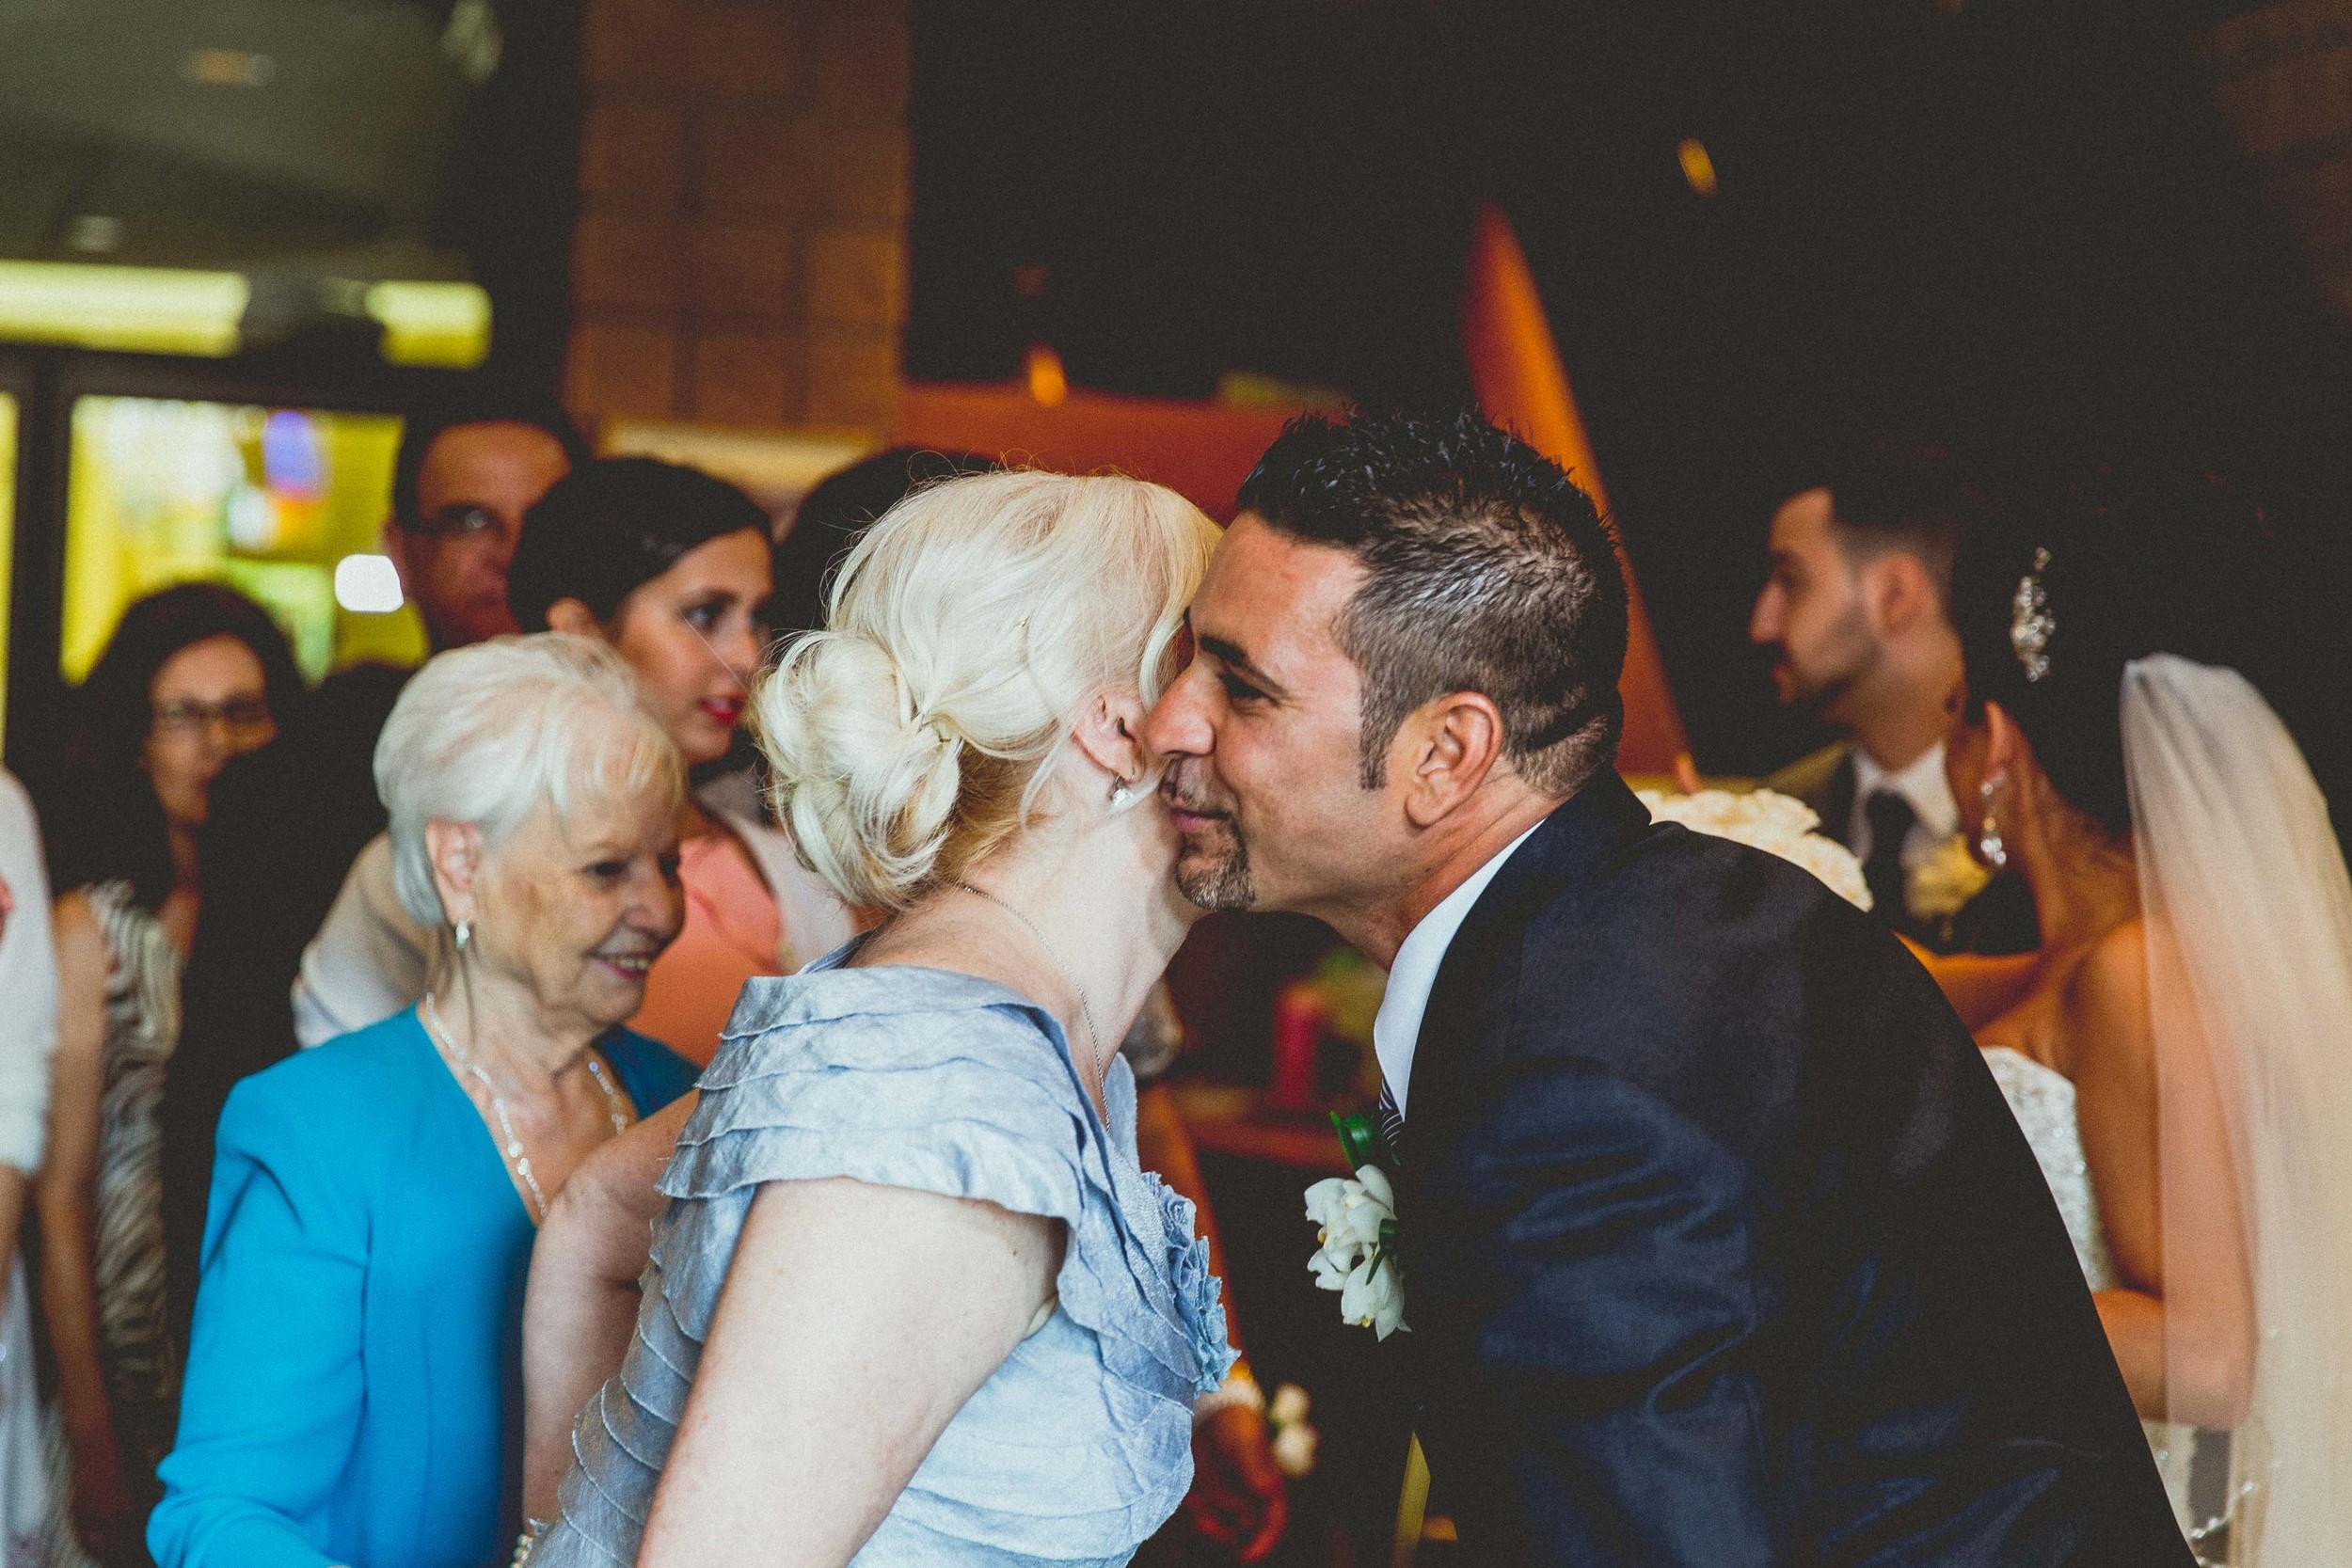 Toronto Wedding Photography | Caterina & Elvis, Pickering catholic wedding (37 of 39).jpg